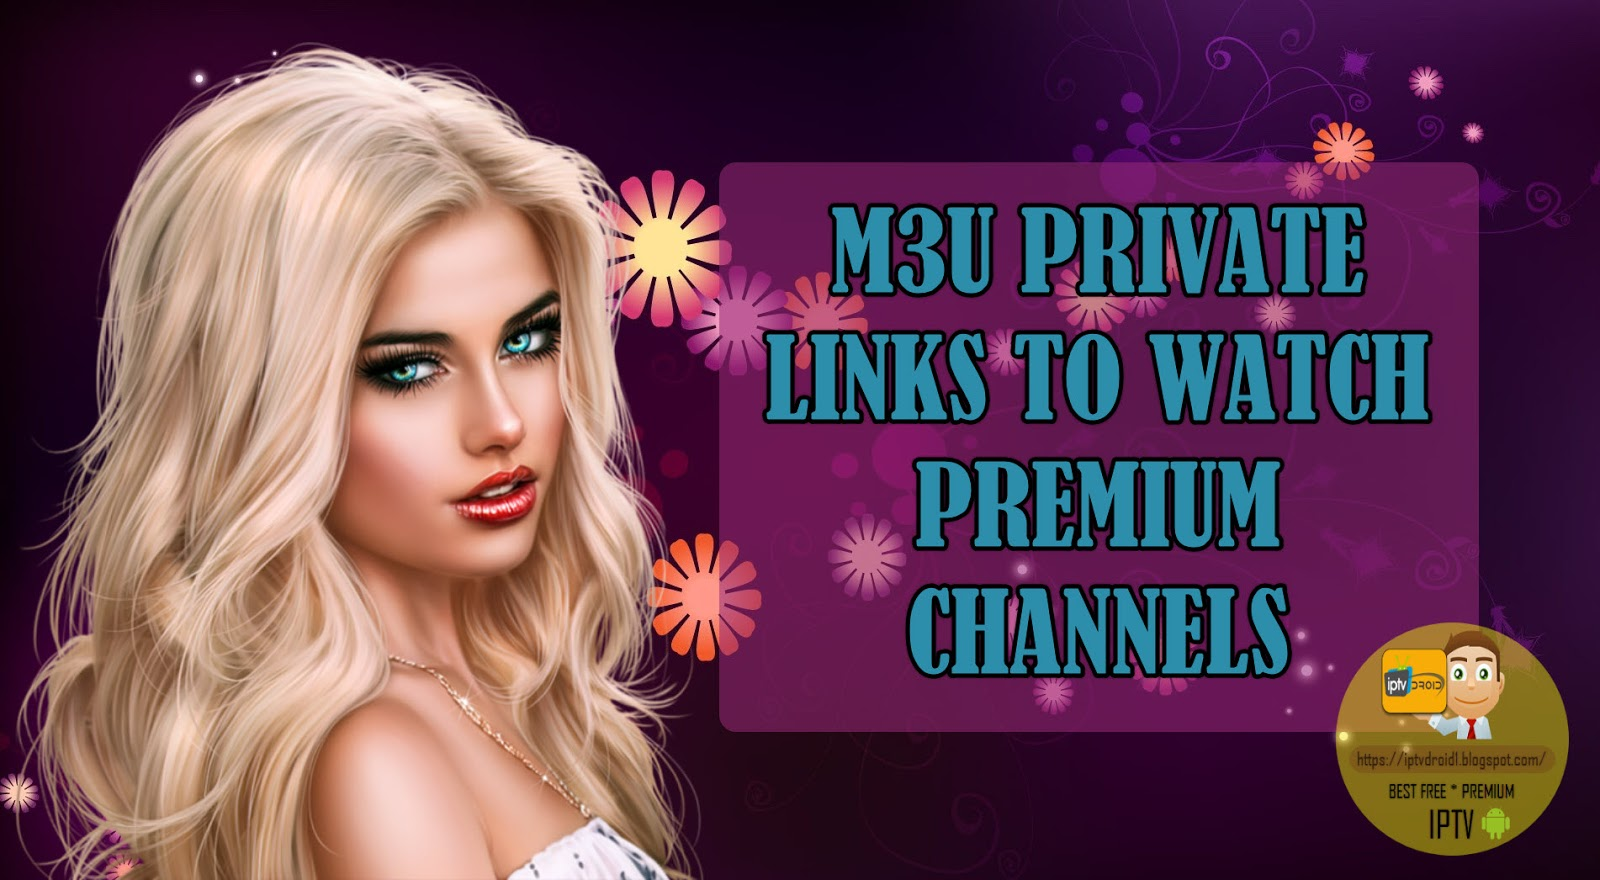 Nuart Tv Iptv Channels